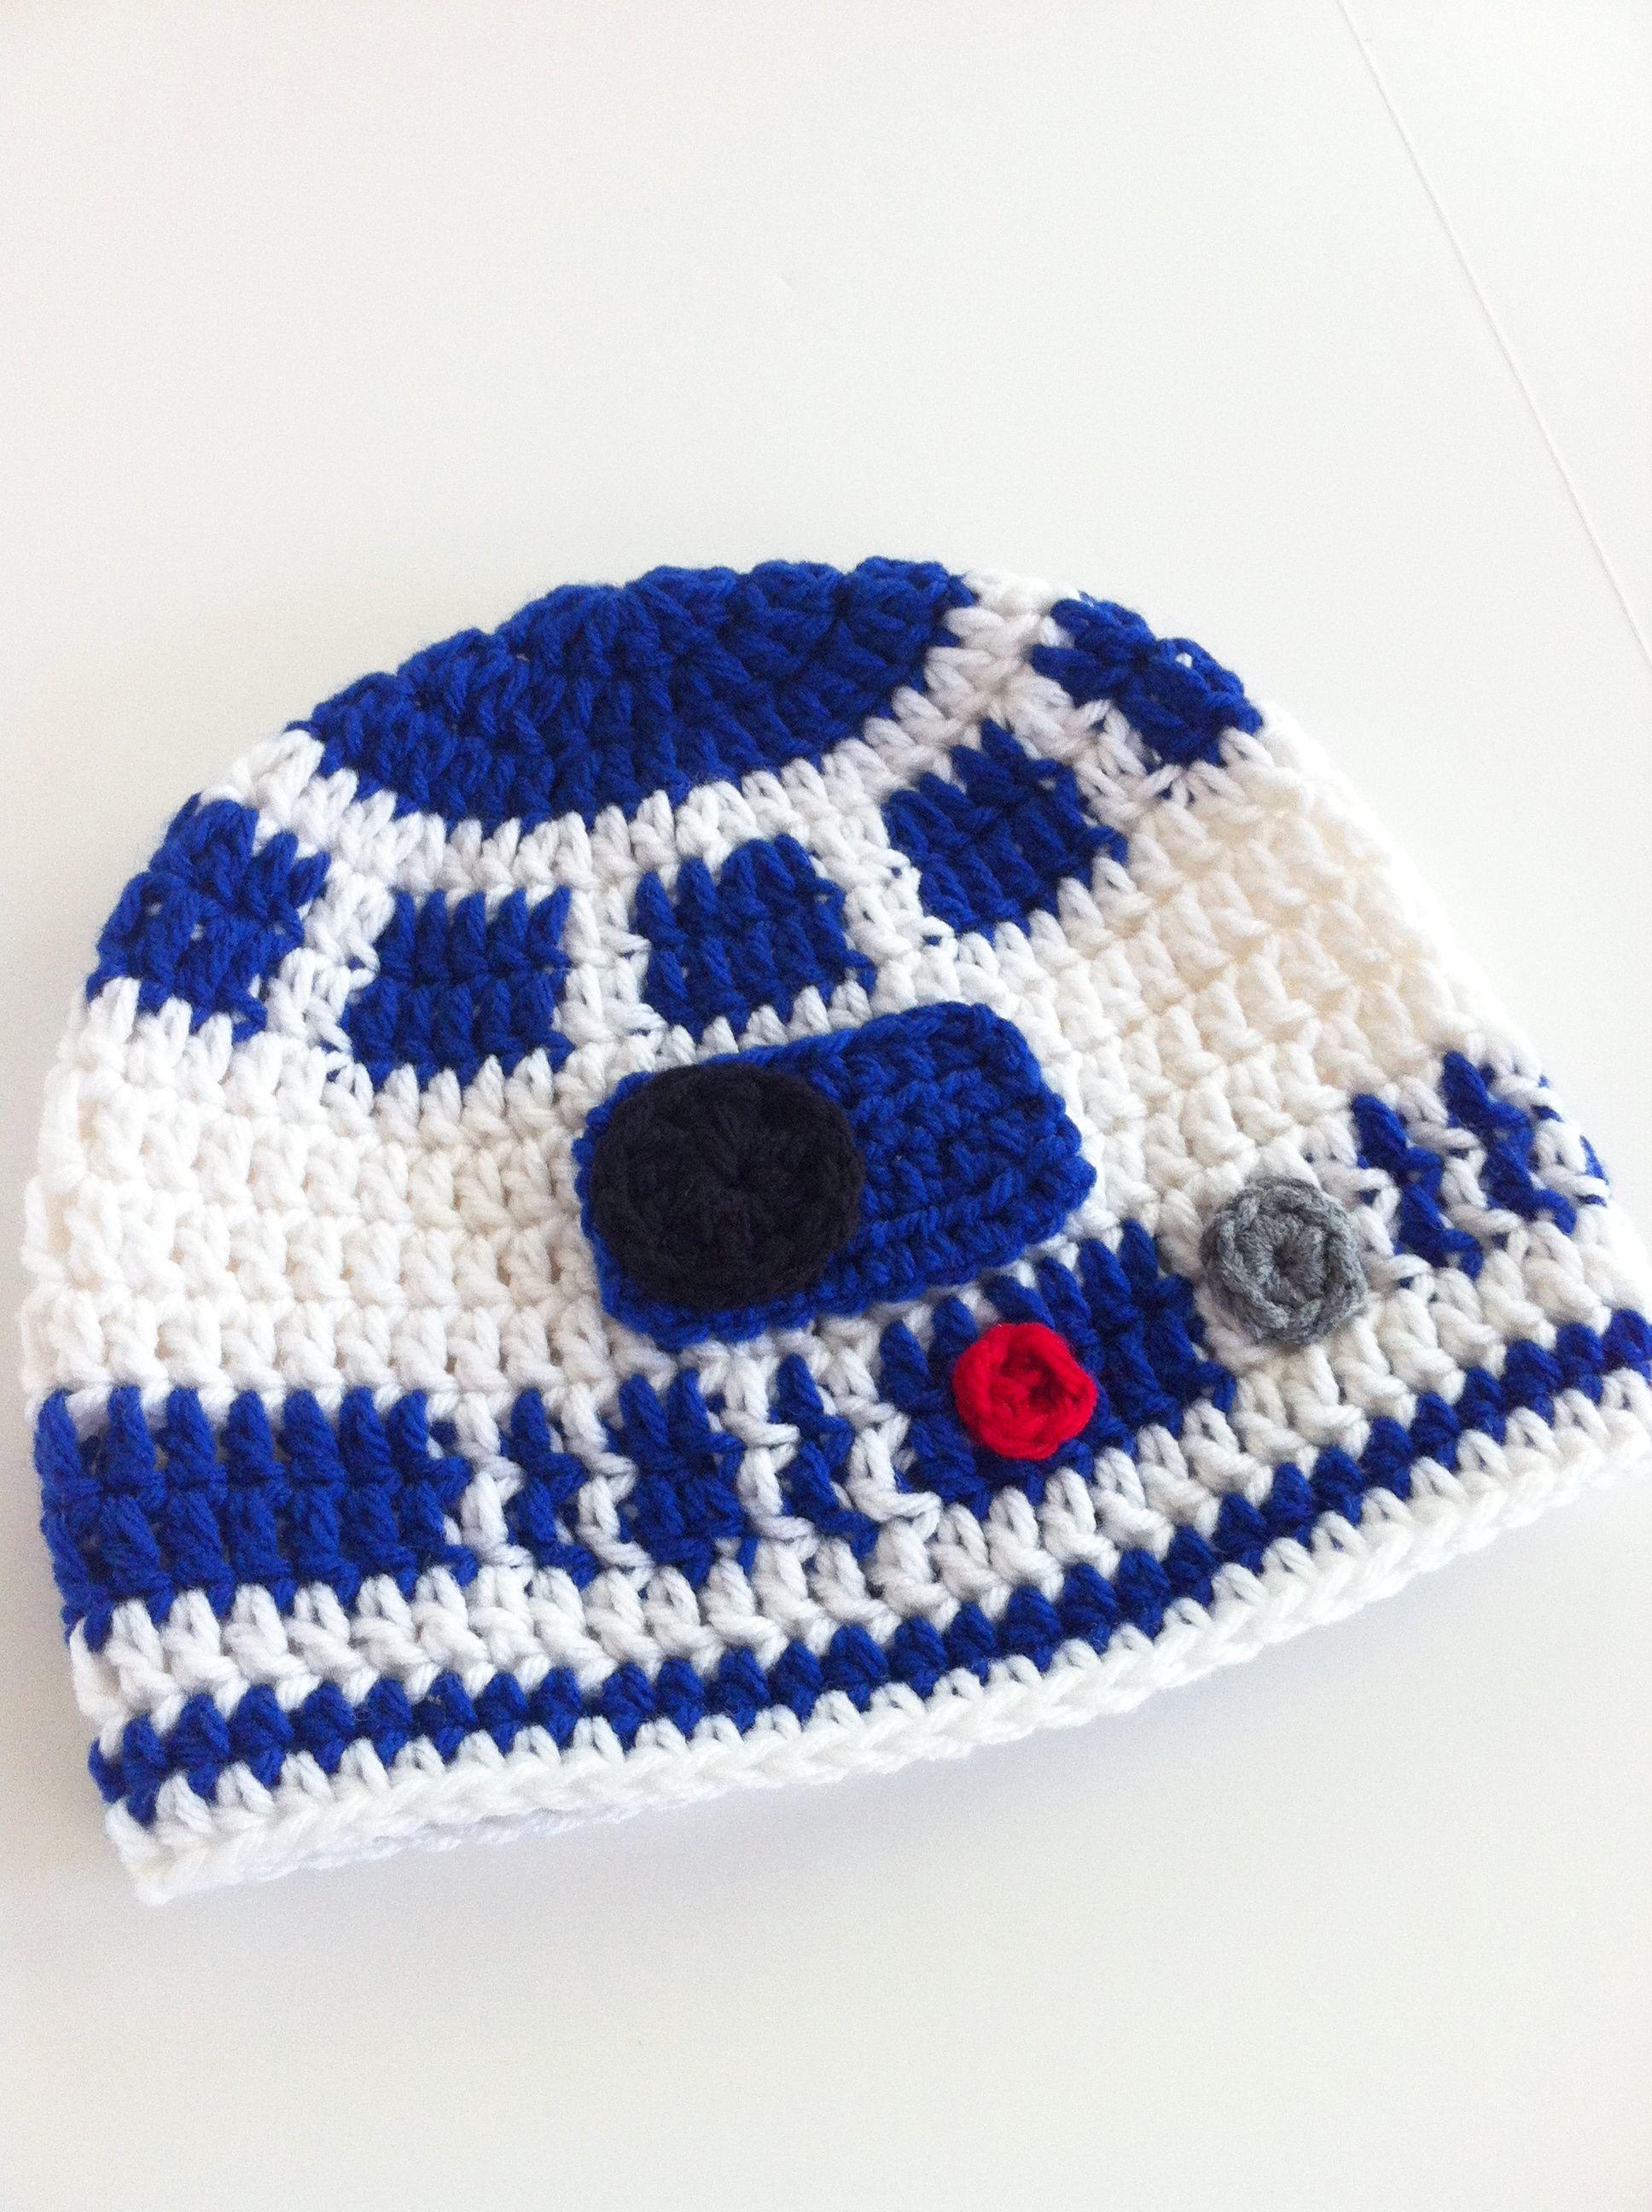 R2D2 Star Wars Hat | Needle Crafts | Pinterest | Crochet, Amigurumi ...